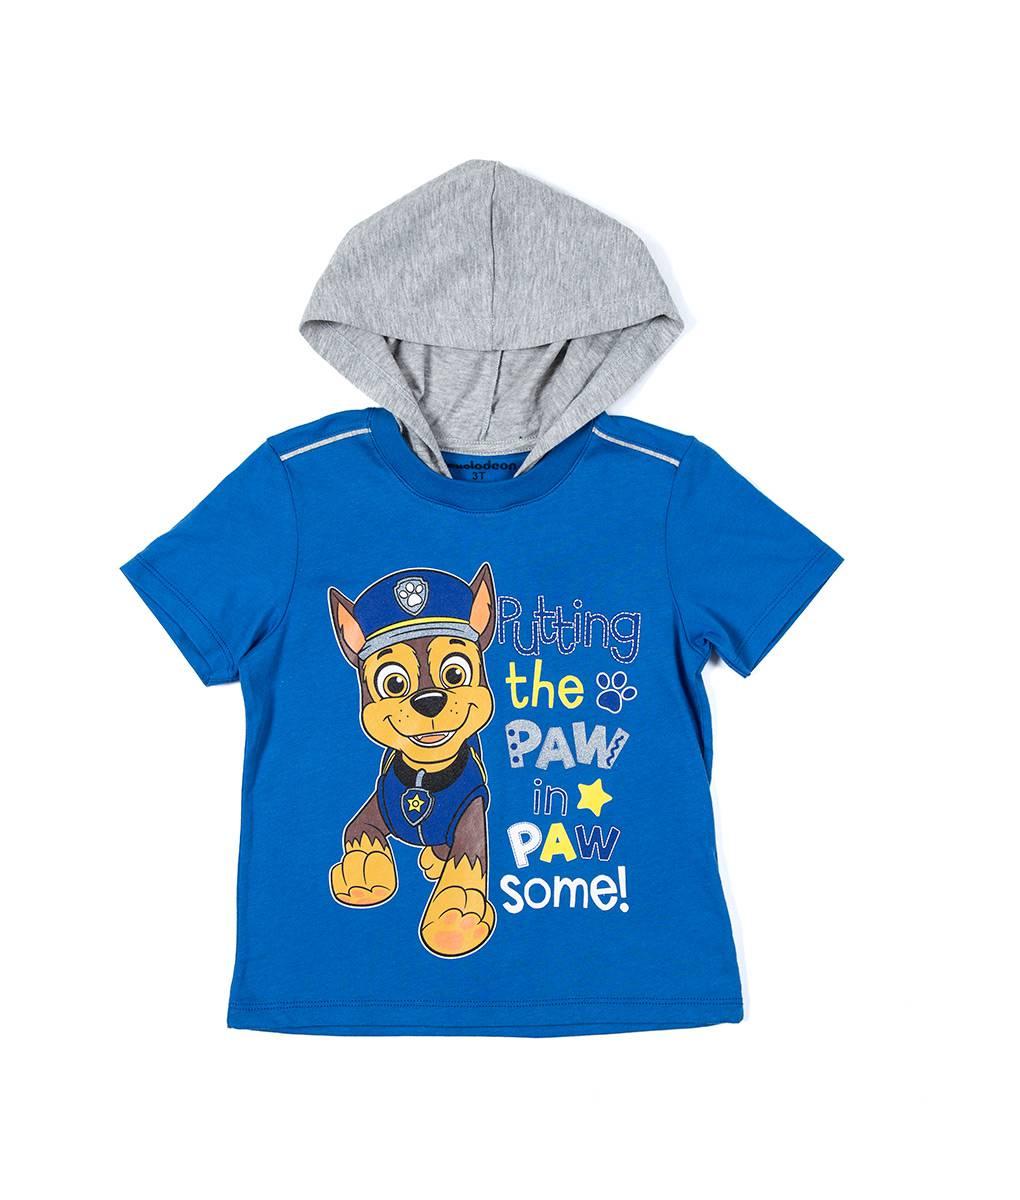 Camiseta capucha niño Paw Patrol          Tallas: 3         Precio: $13,00